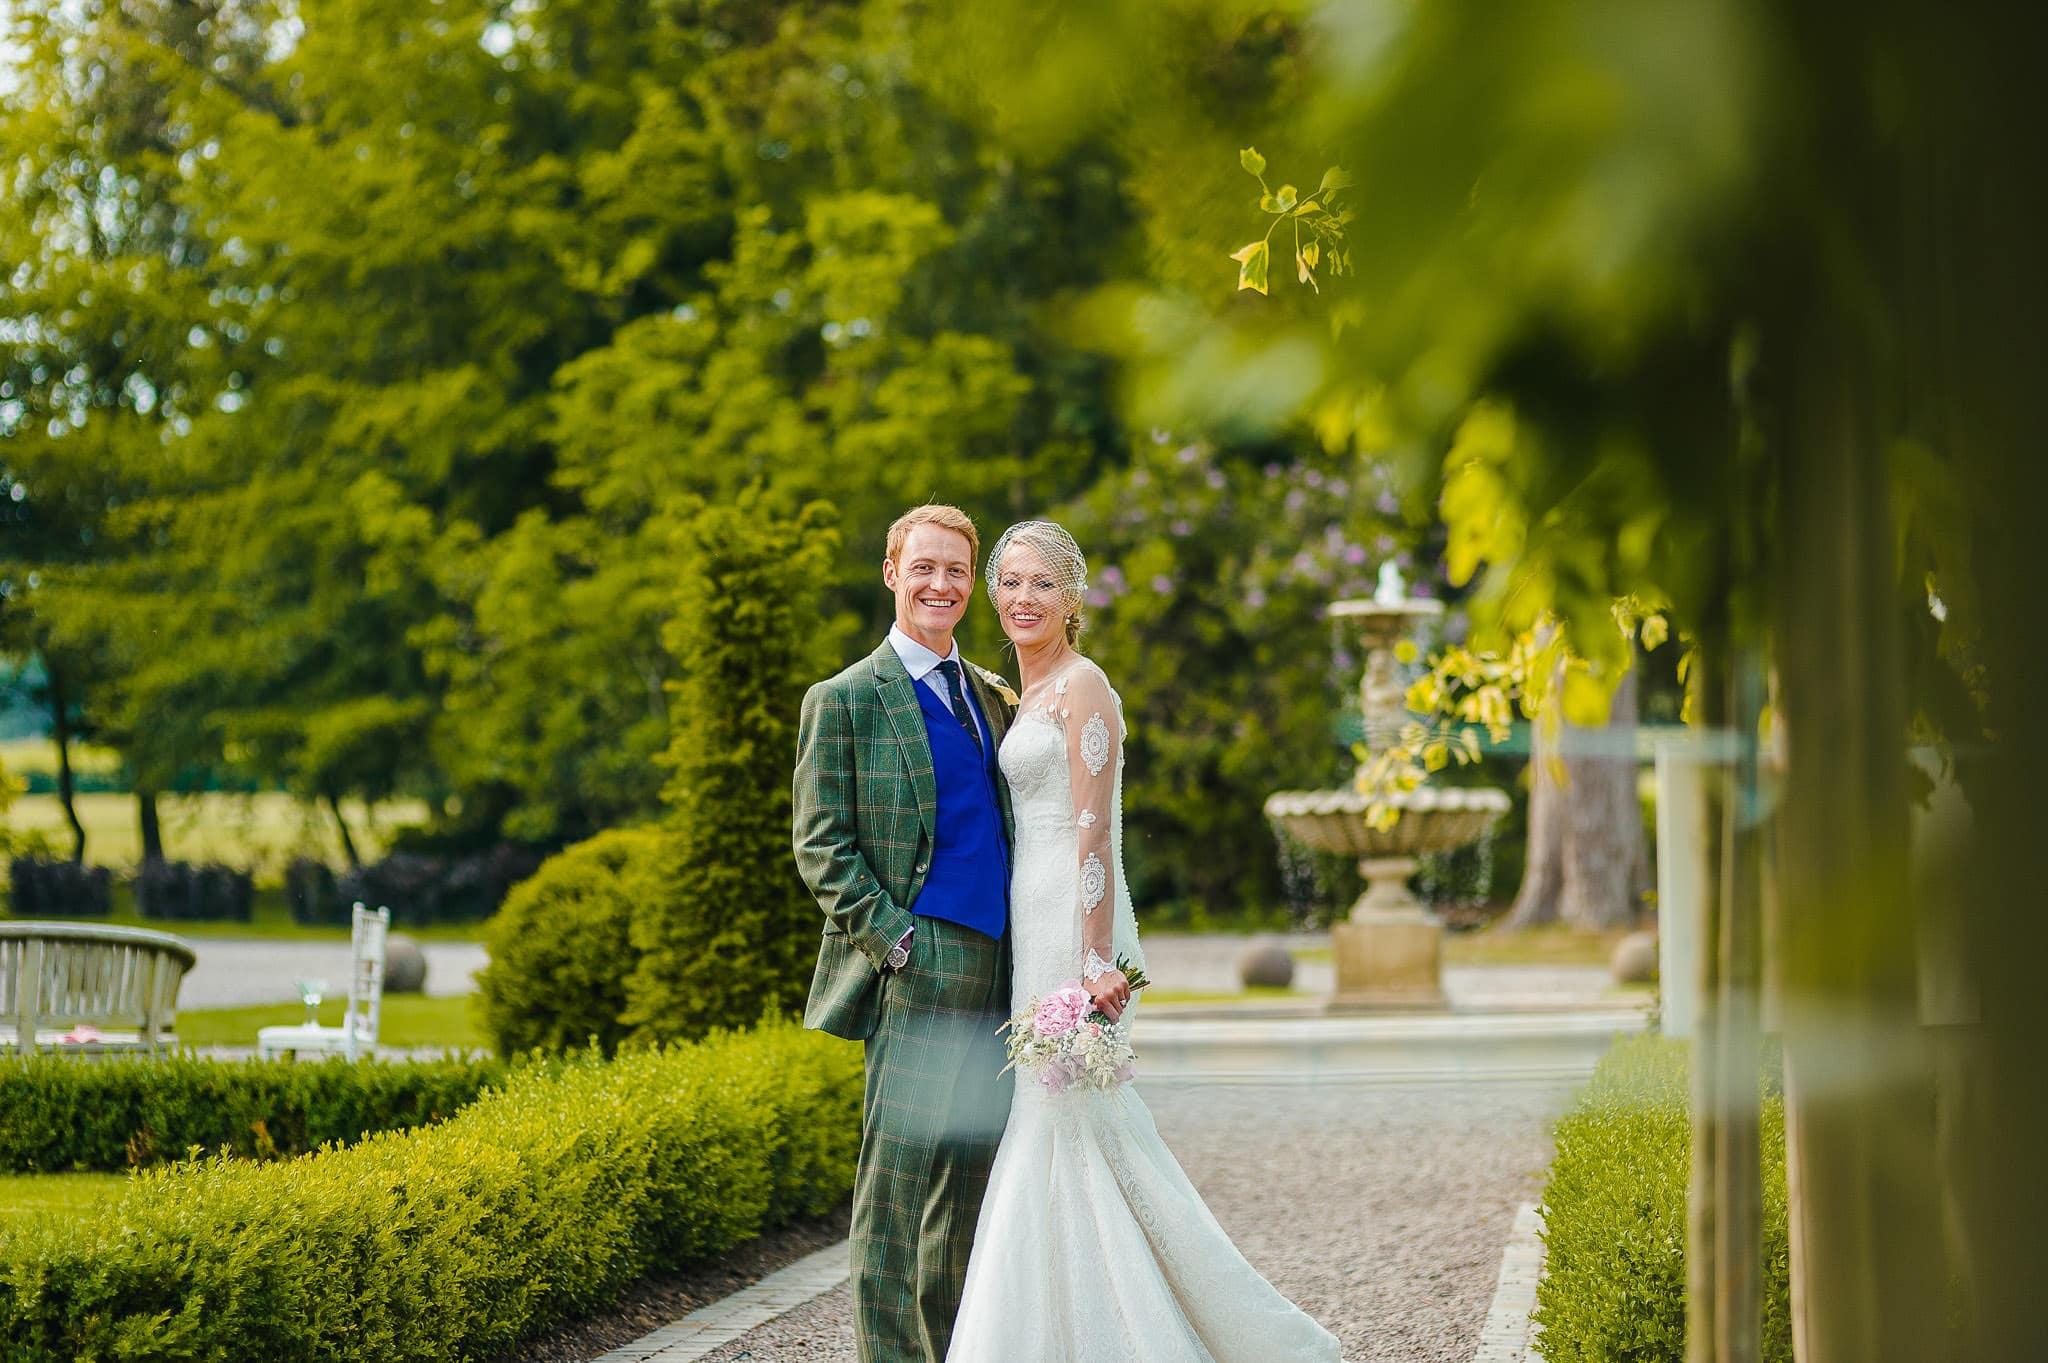 Lemore Manor Wedding Photographer | Hannah and Angus 56